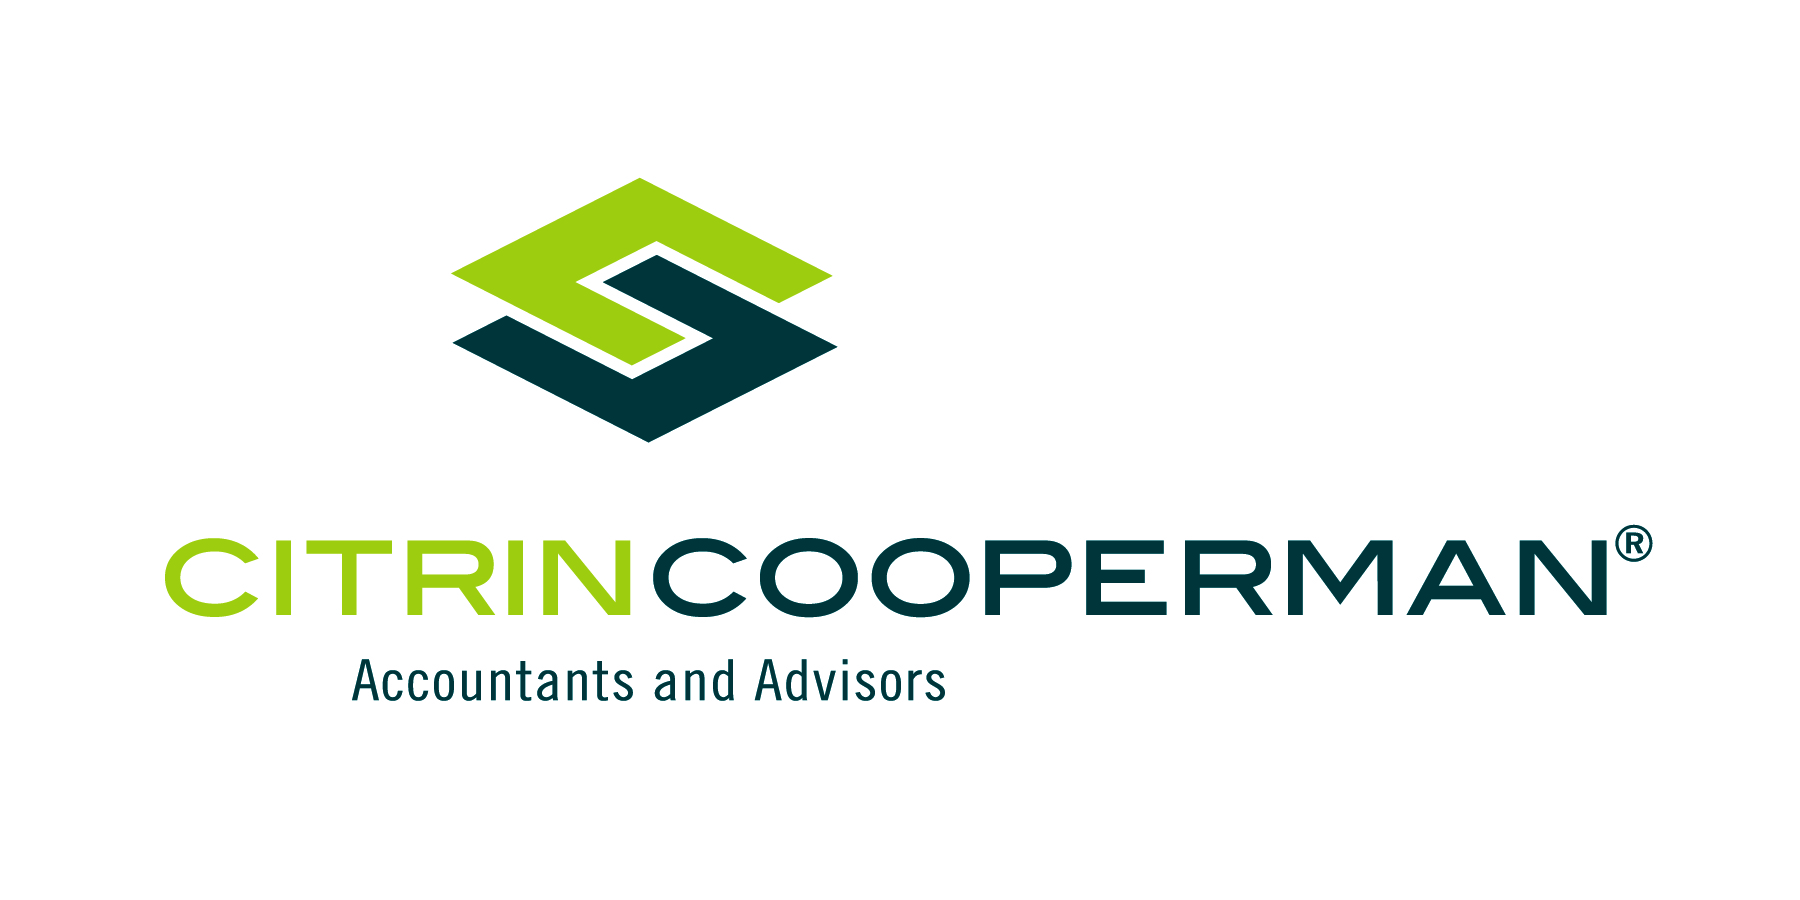 pillars of franchising-citrin cooperman